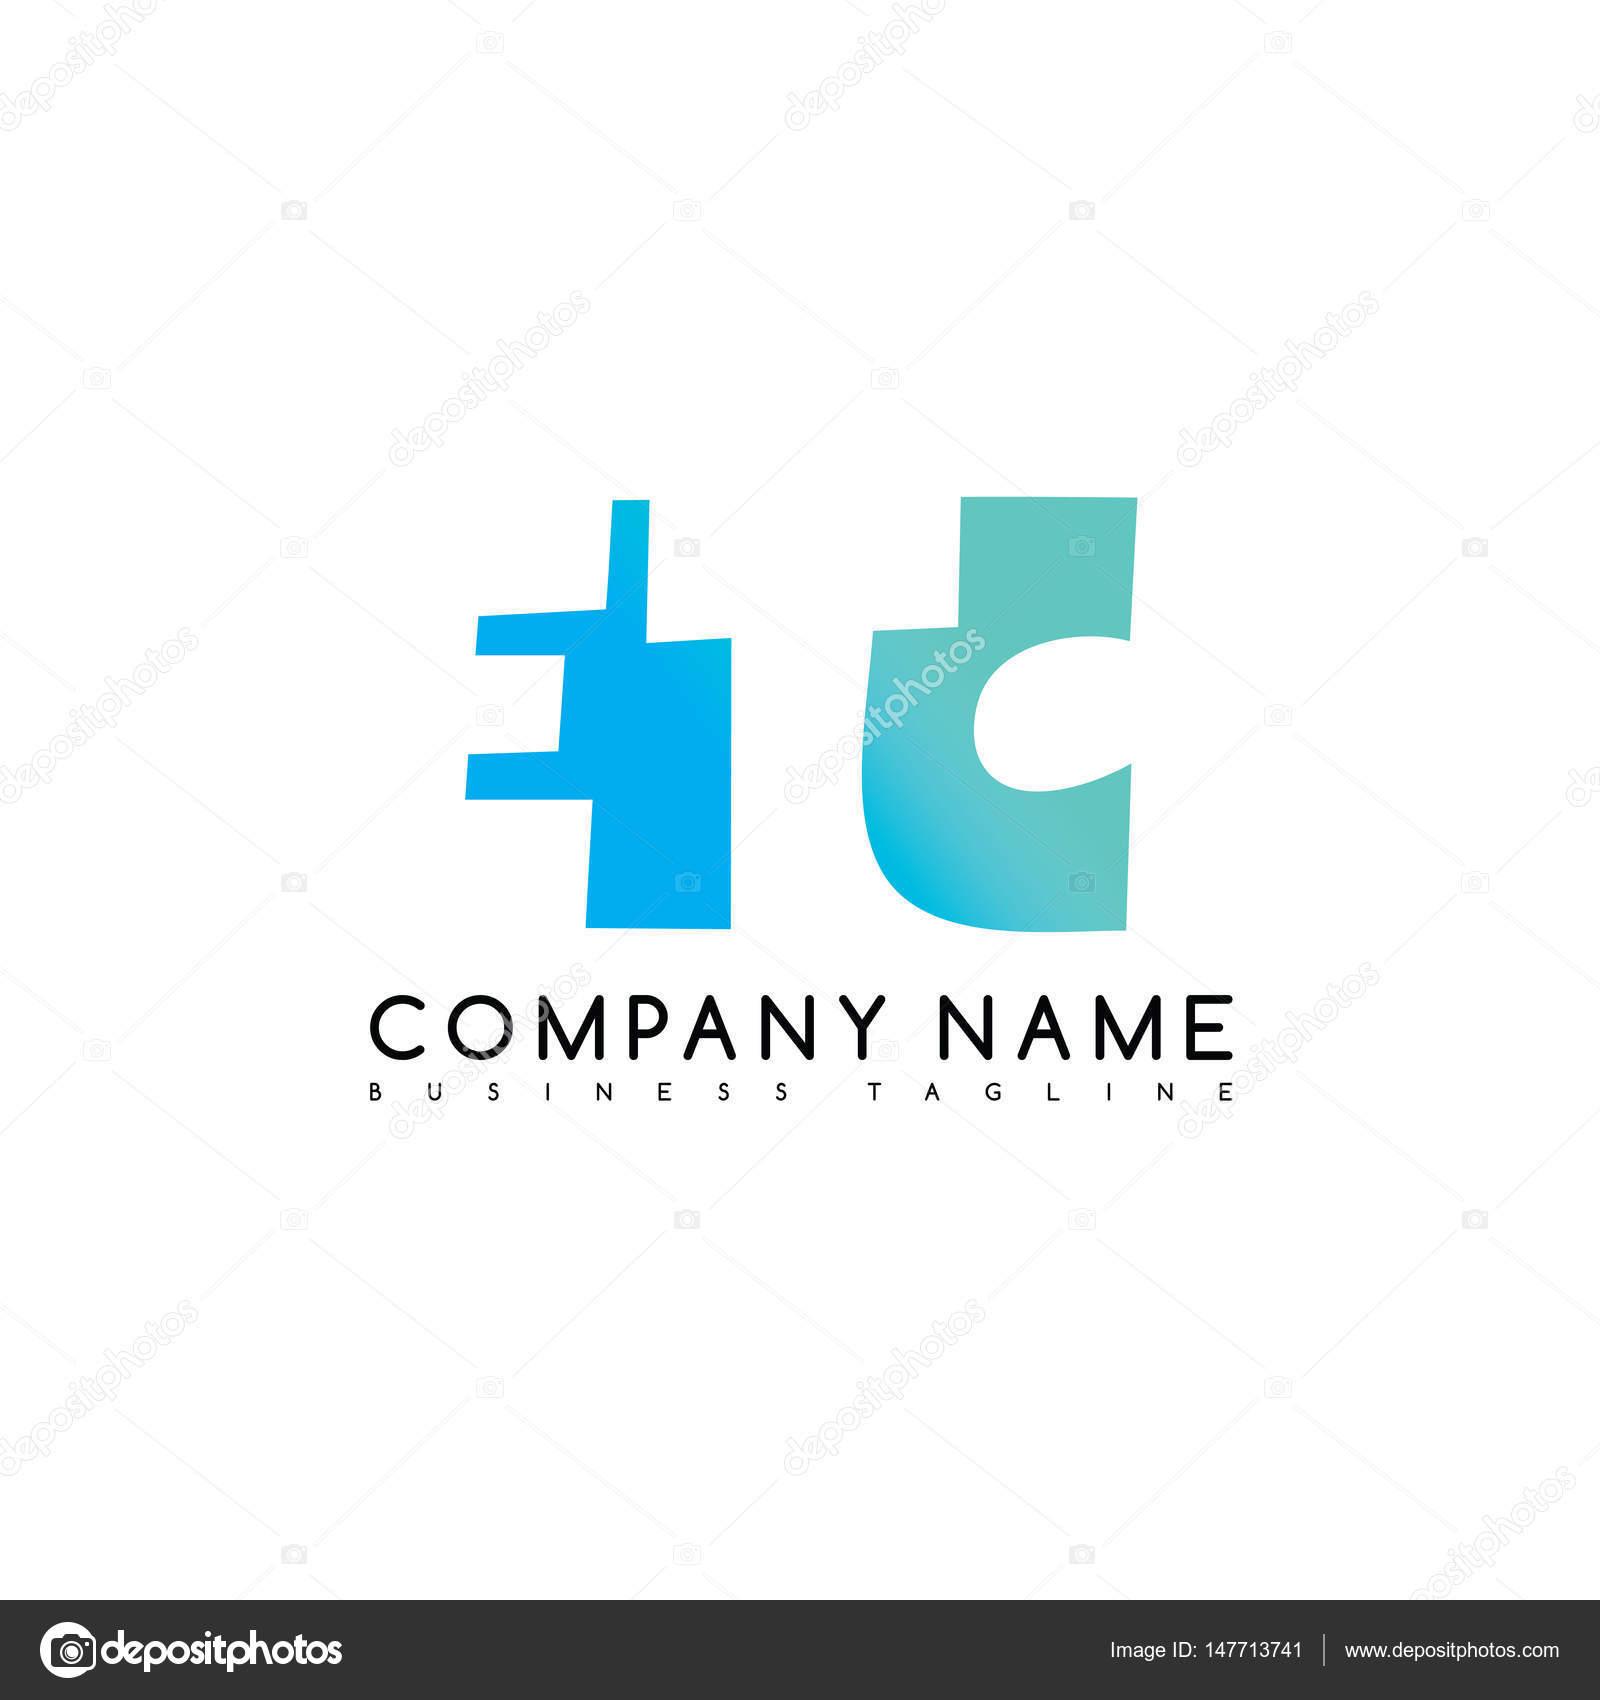 Company name business tagline stock vector vectorfirst 147713741 company name business tagline stock vector buycottarizona